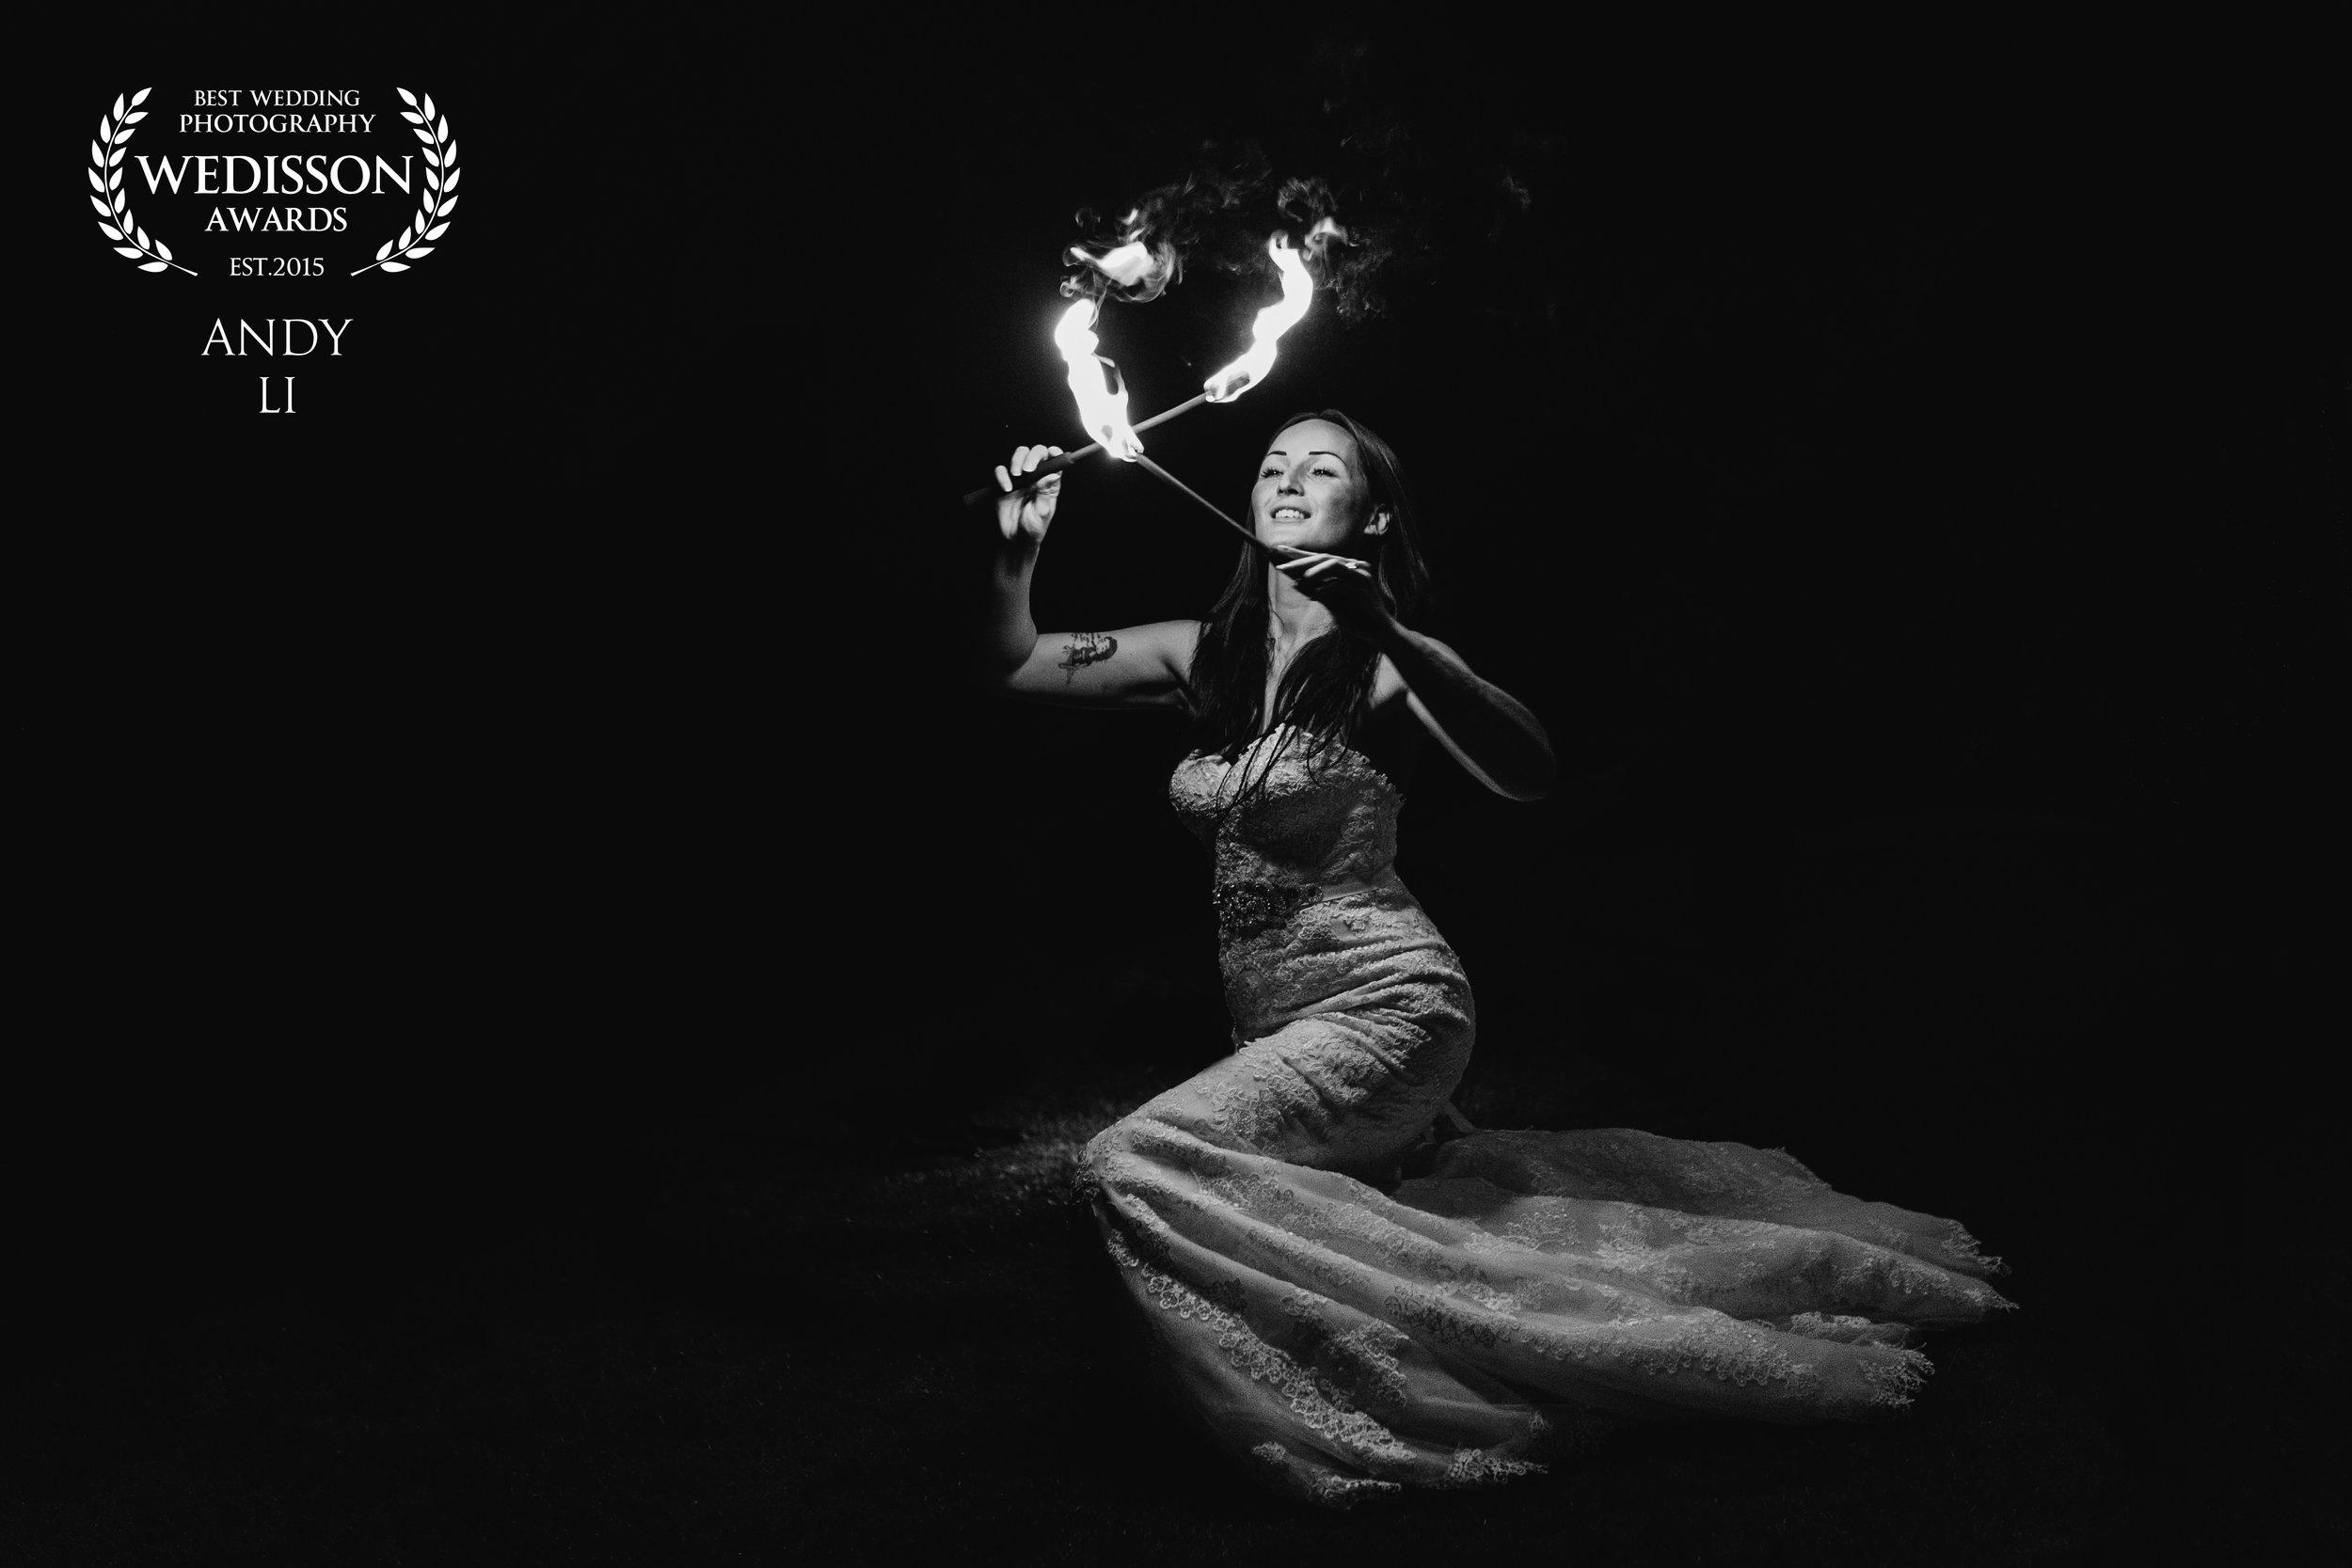 Wedisson Award Andy Li Photography.jpg